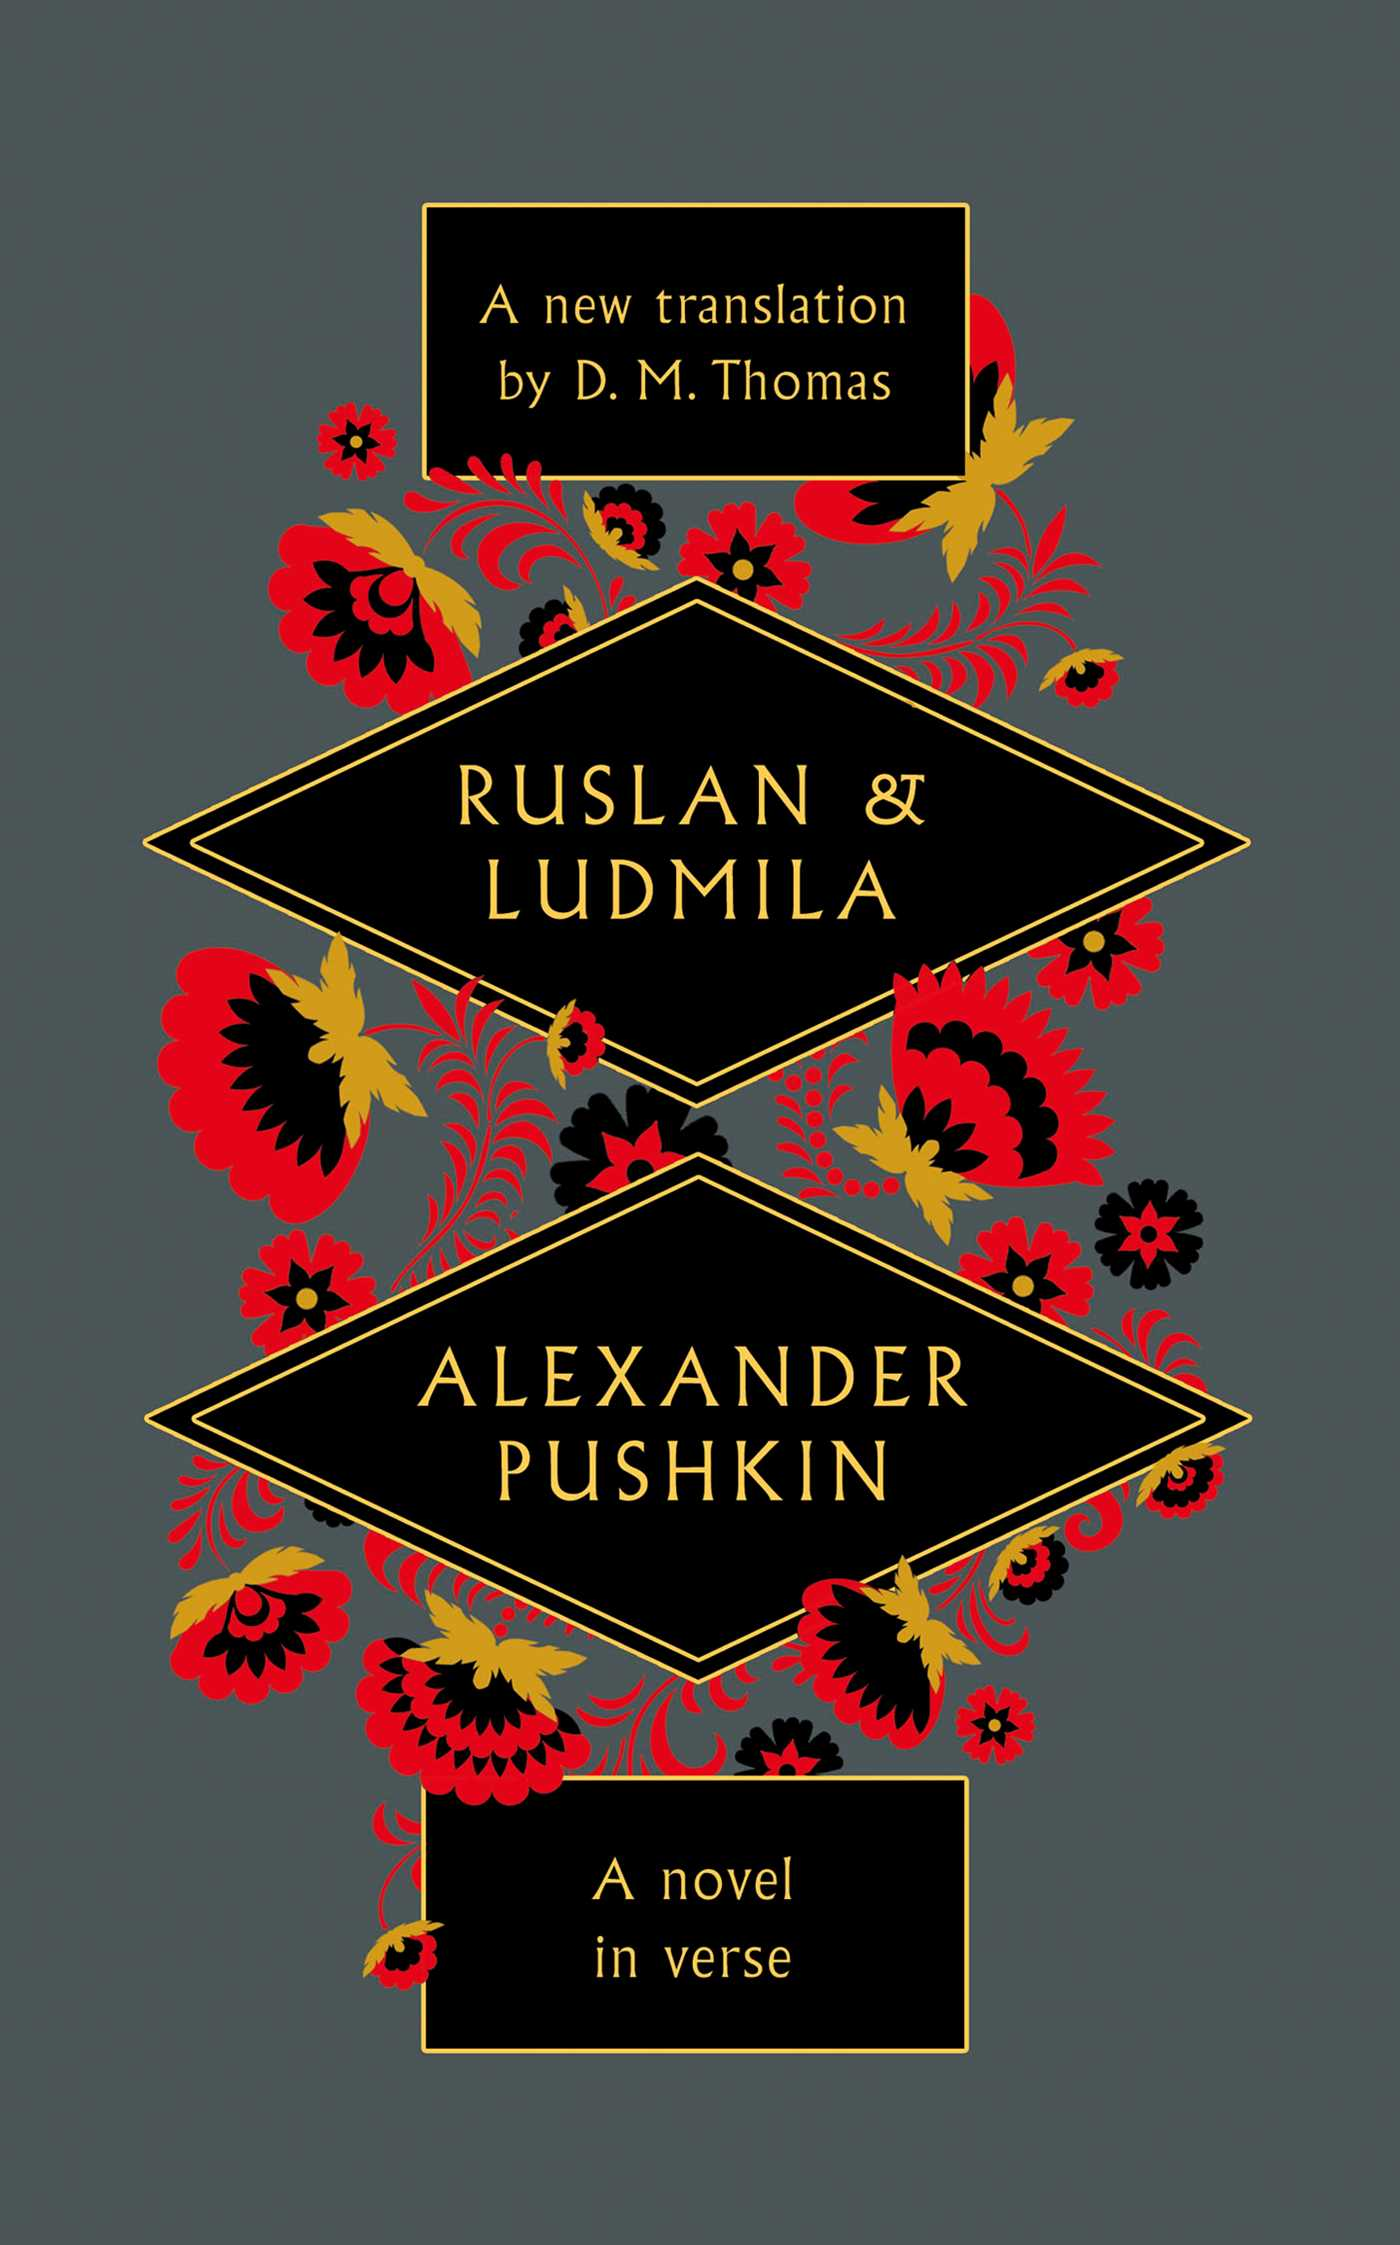 Ruslan and ludmila 9781471177453 hr